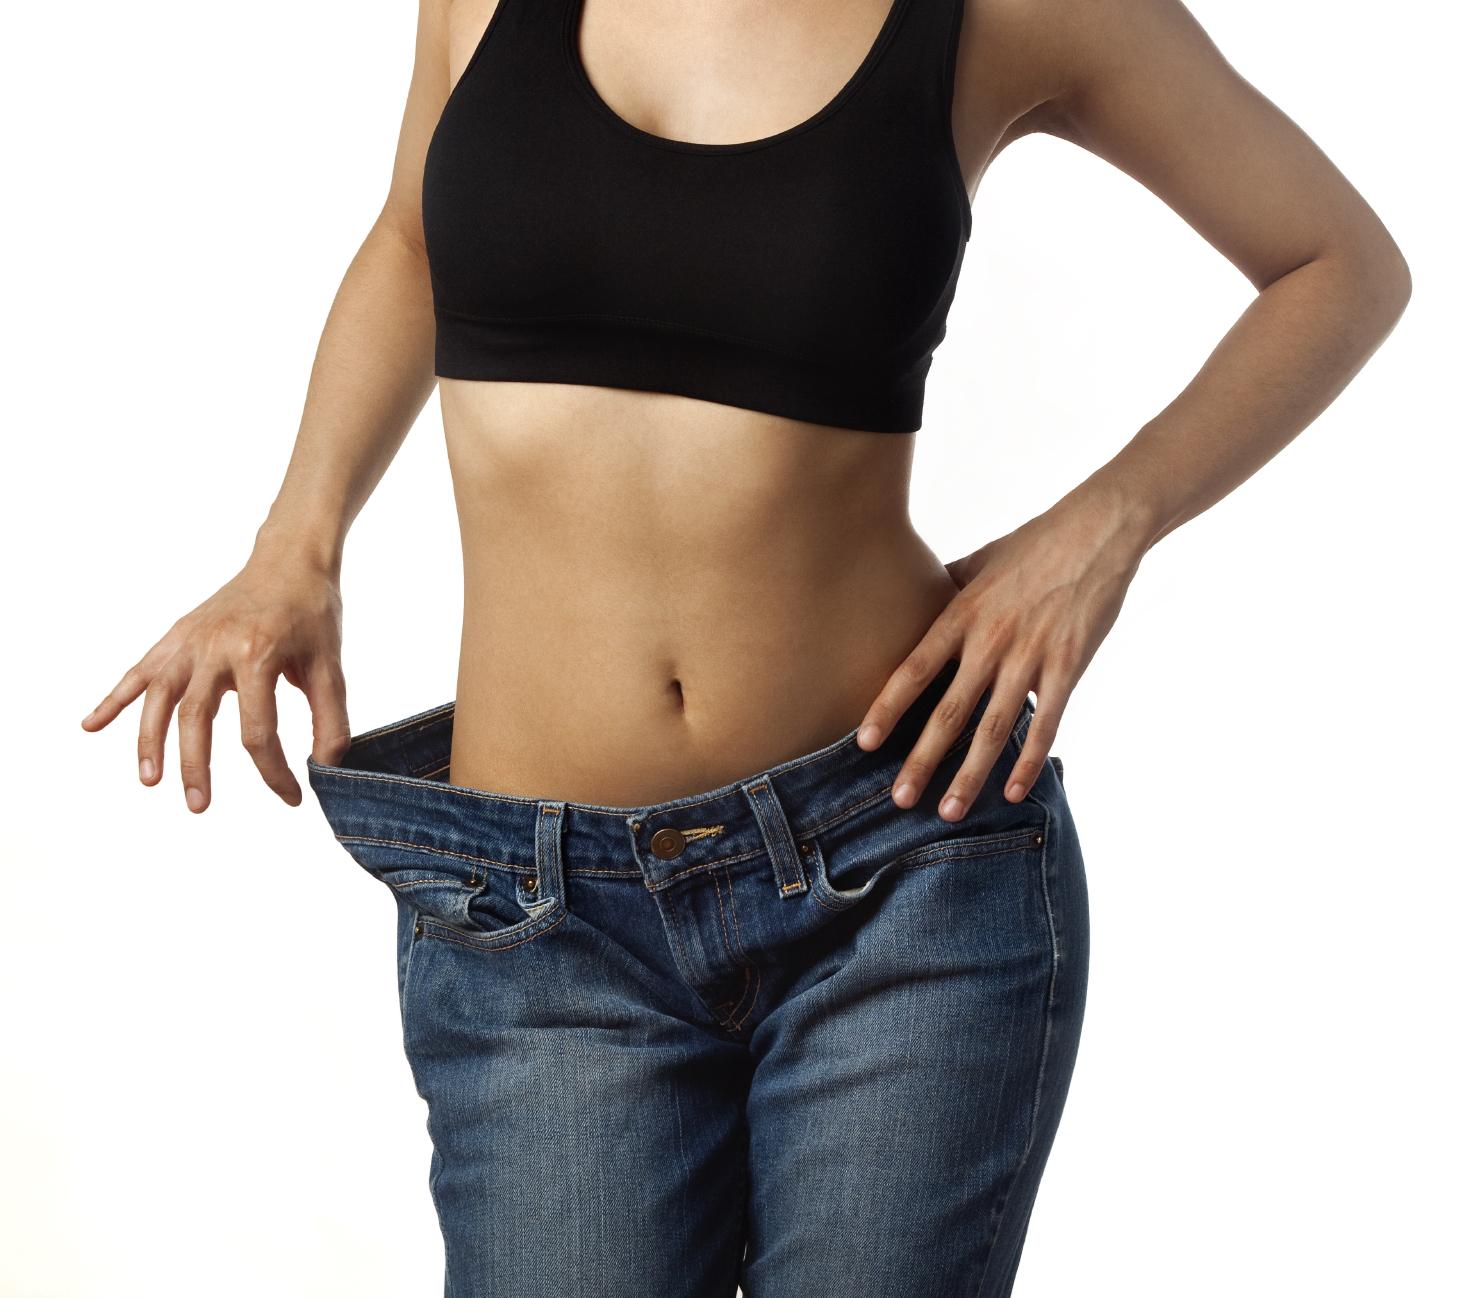 weight-loss-program-24